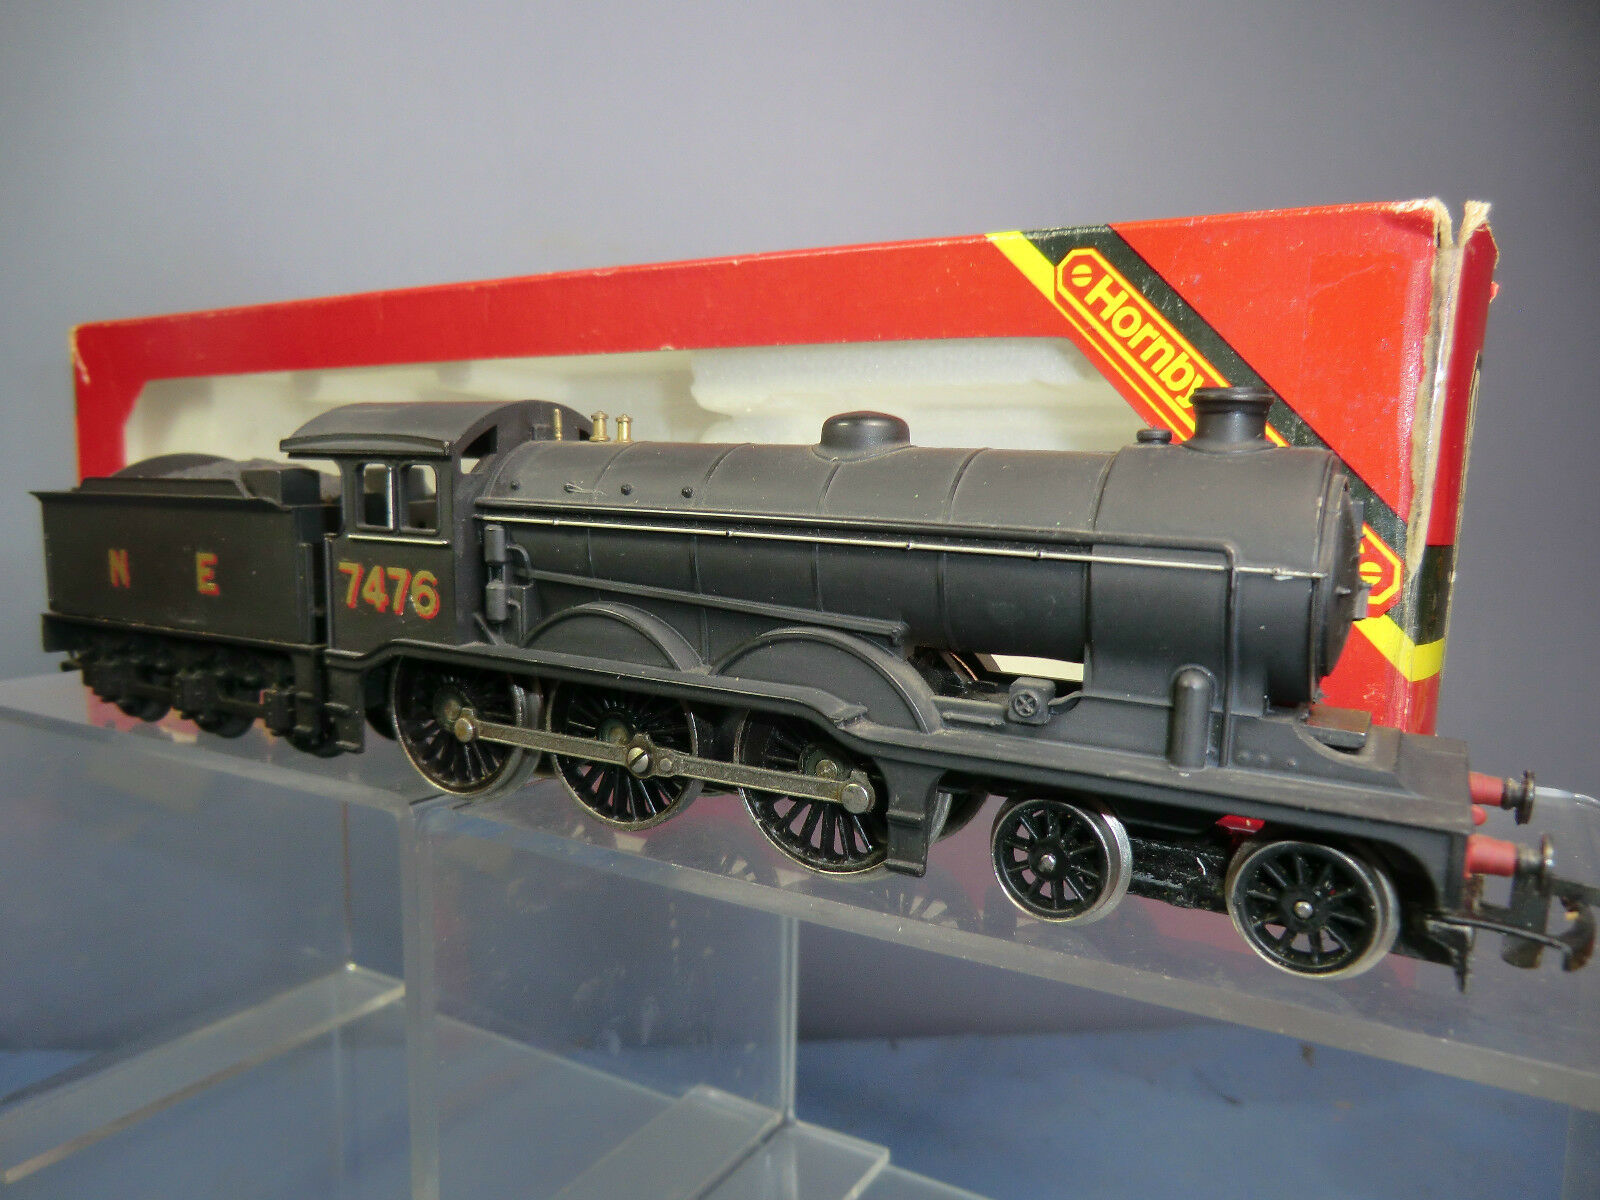 HORNBY RAILWAYS MODEL No.R150 NE CLASS B12 4-6-0 No.7406 LOCO & TENDER VN MIB